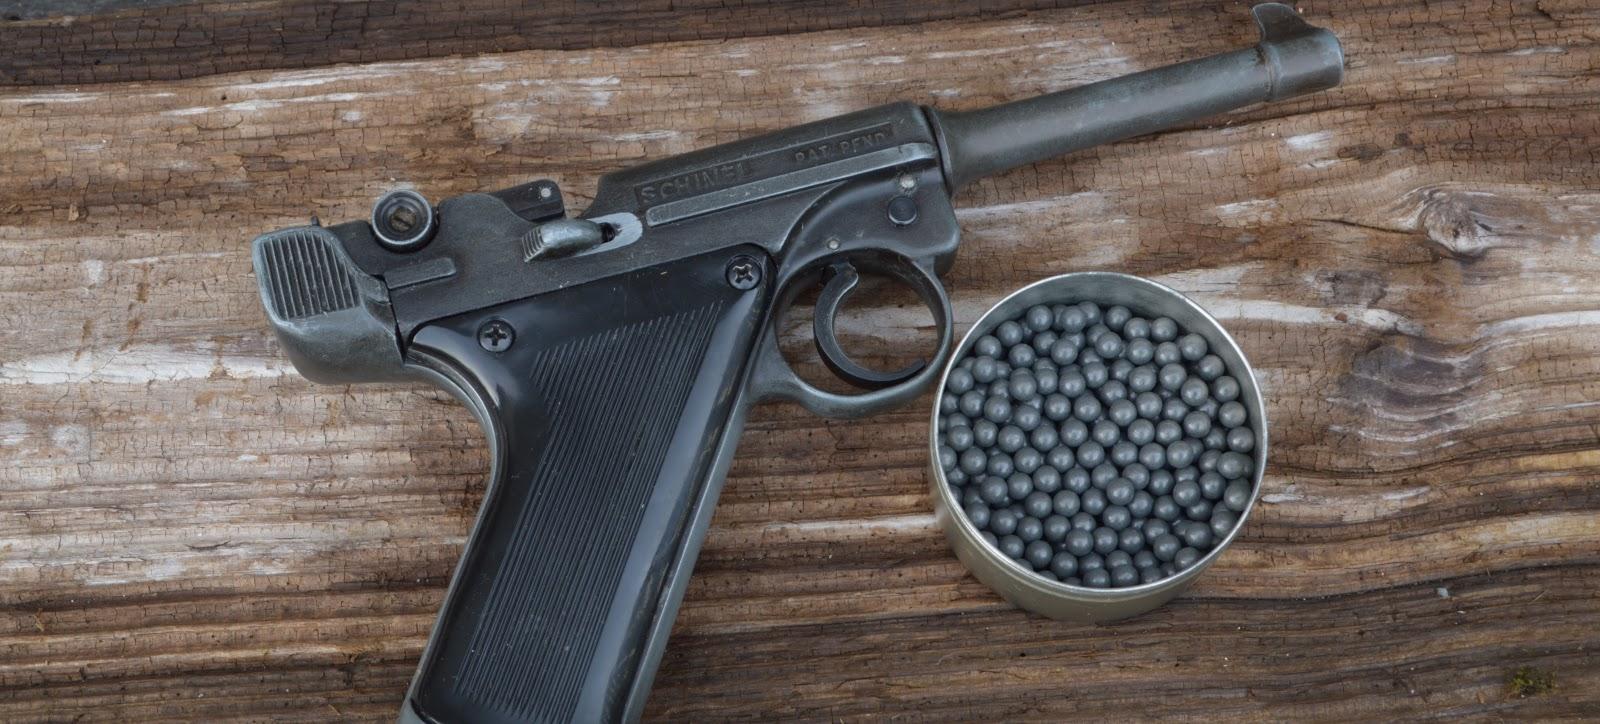 An air pistols using ball ammo